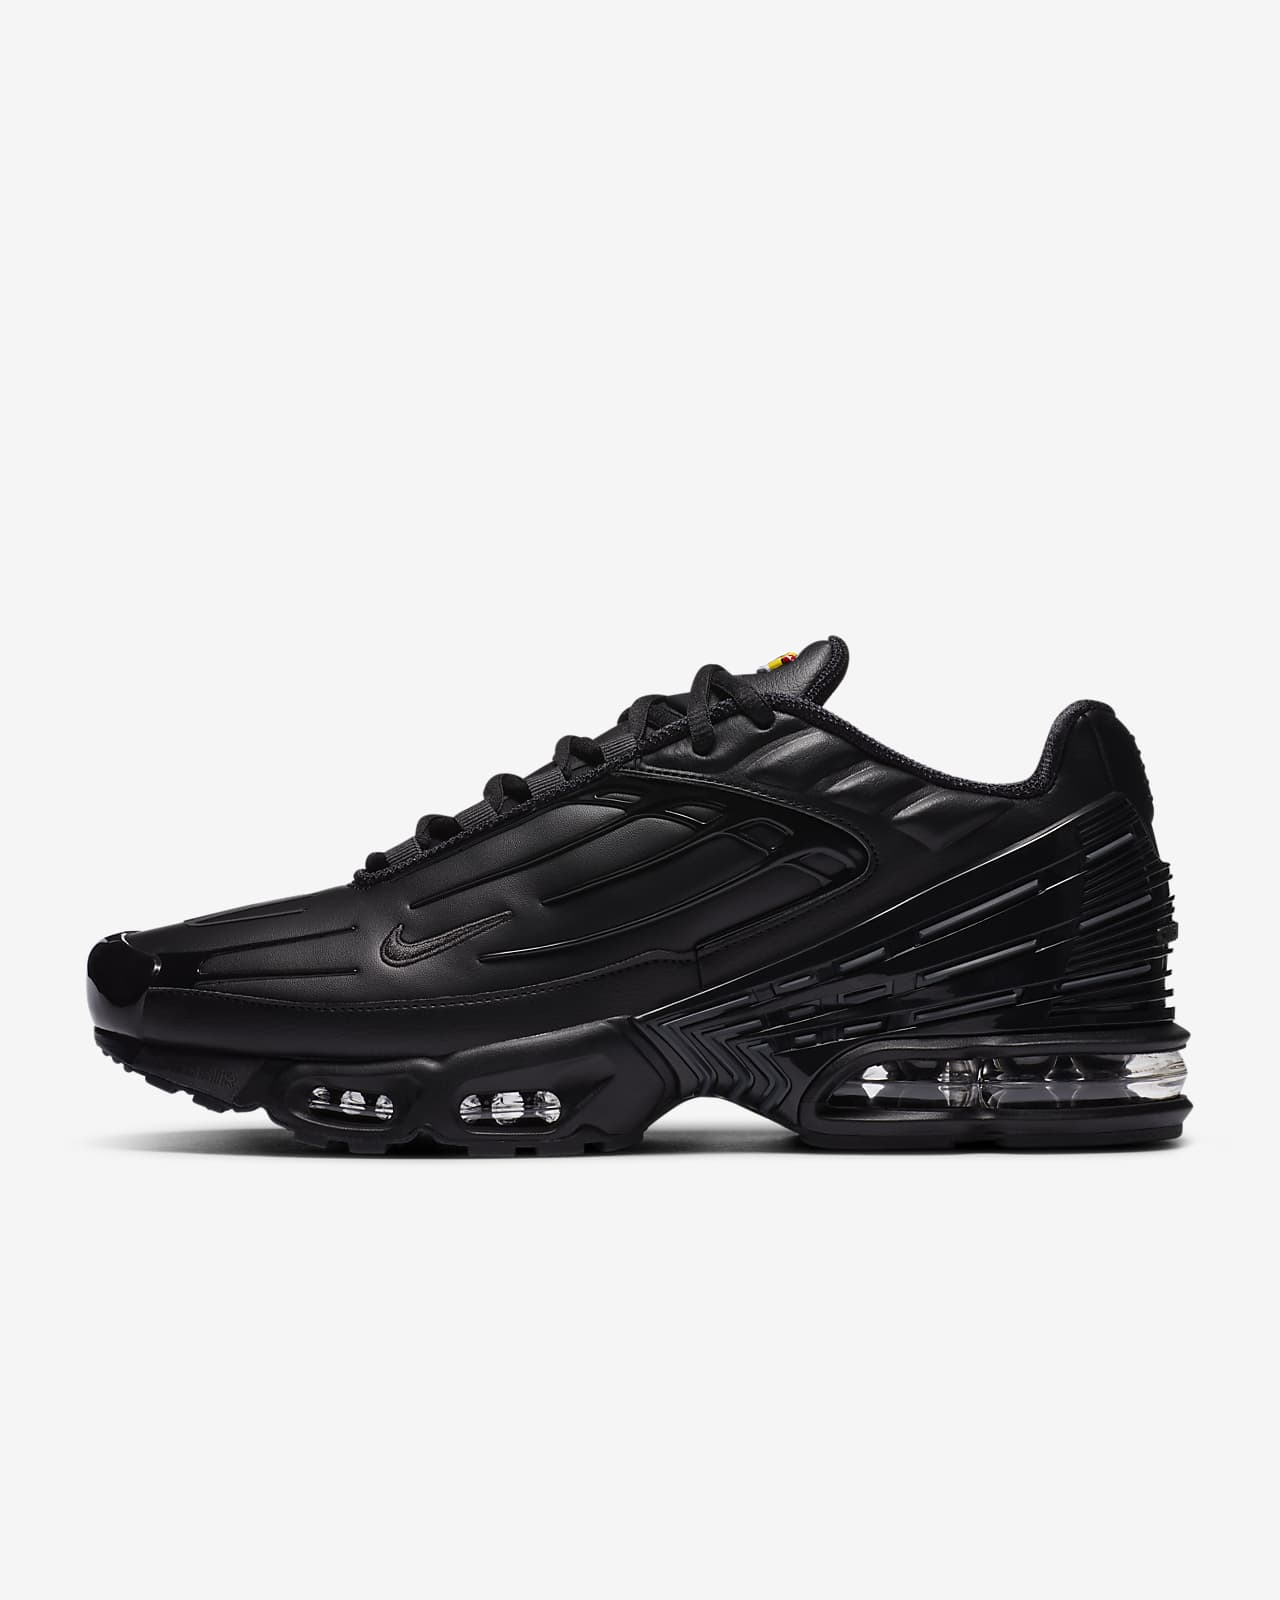 Nike Air Max Plus 3 Leather Men's Shoe